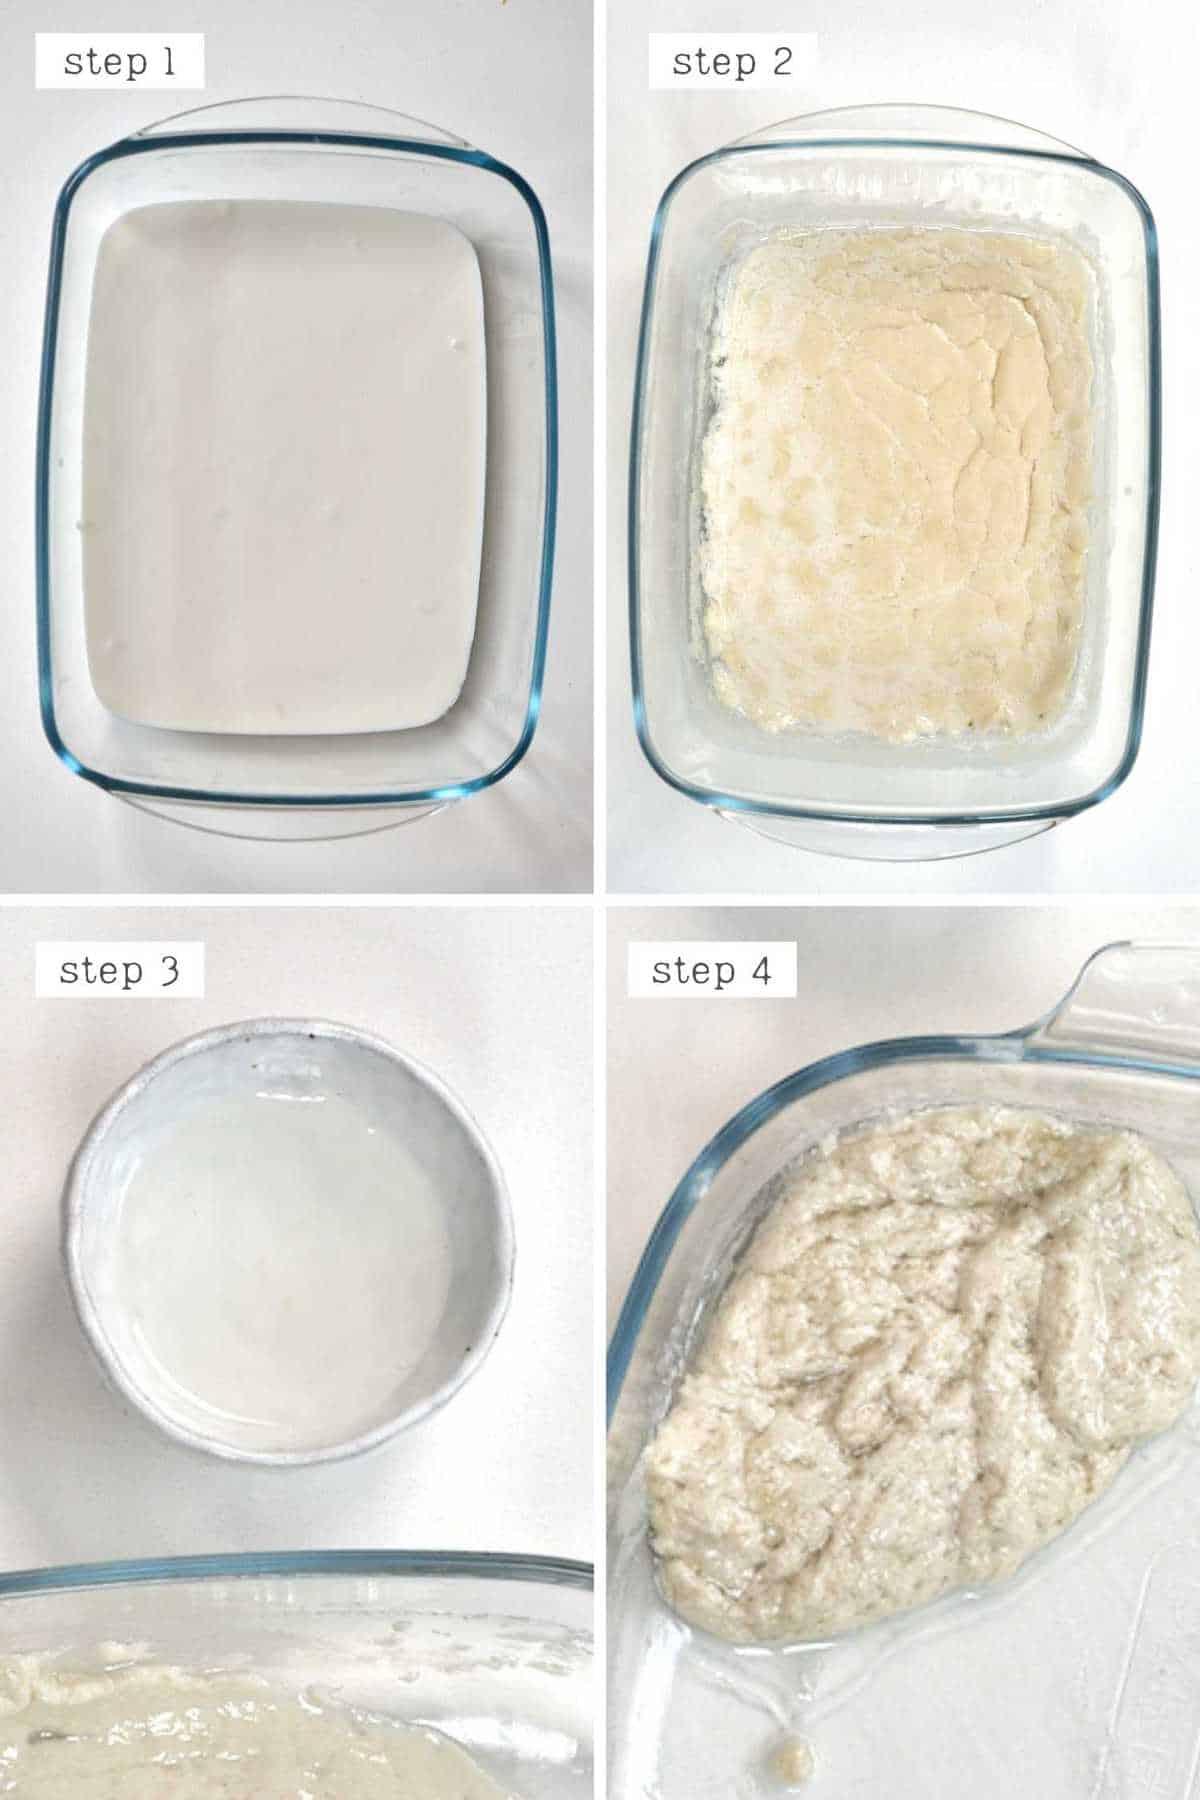 Steps for obtaining extra virgin coconut oil